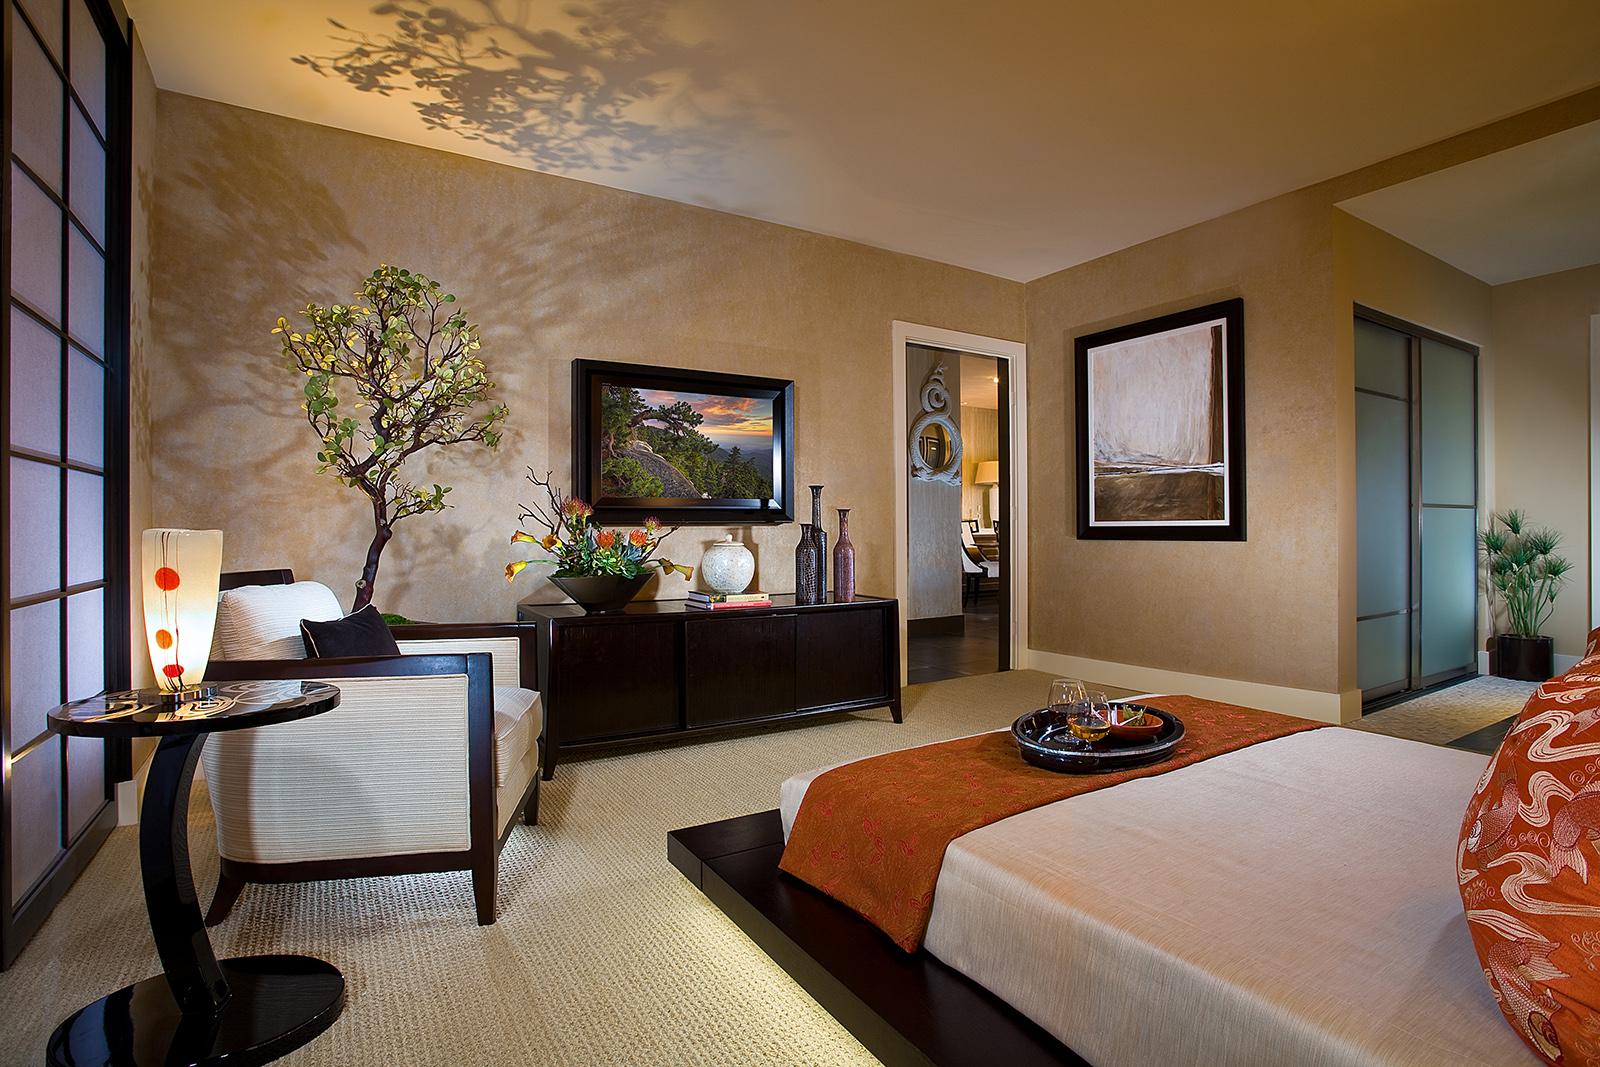 Oriental bedroom ideas